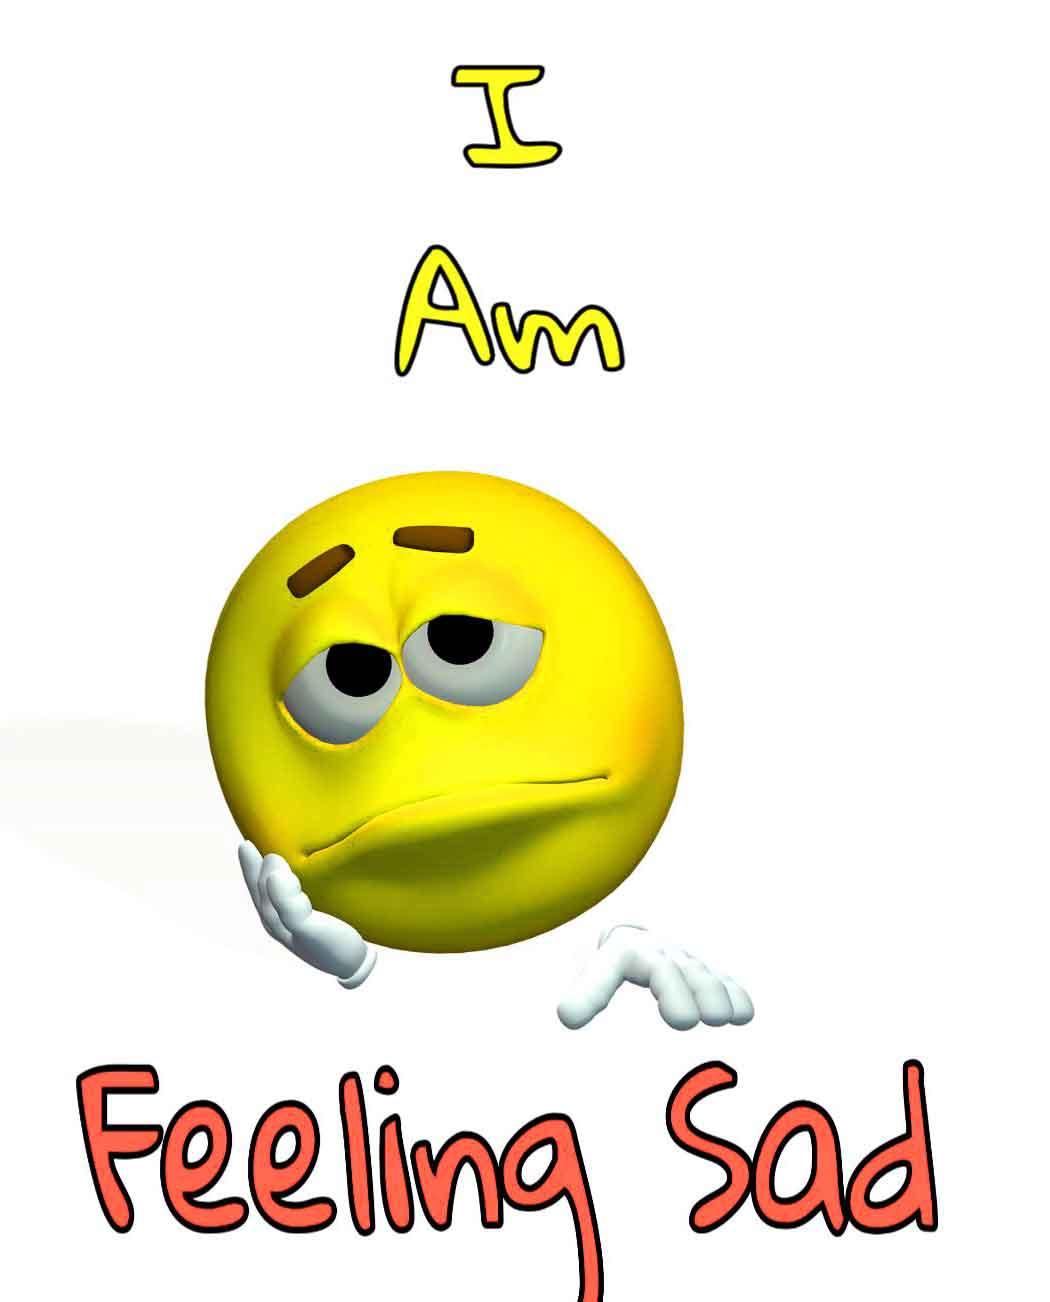 awesome k Feeling Sad Whatsapp dp pics hd